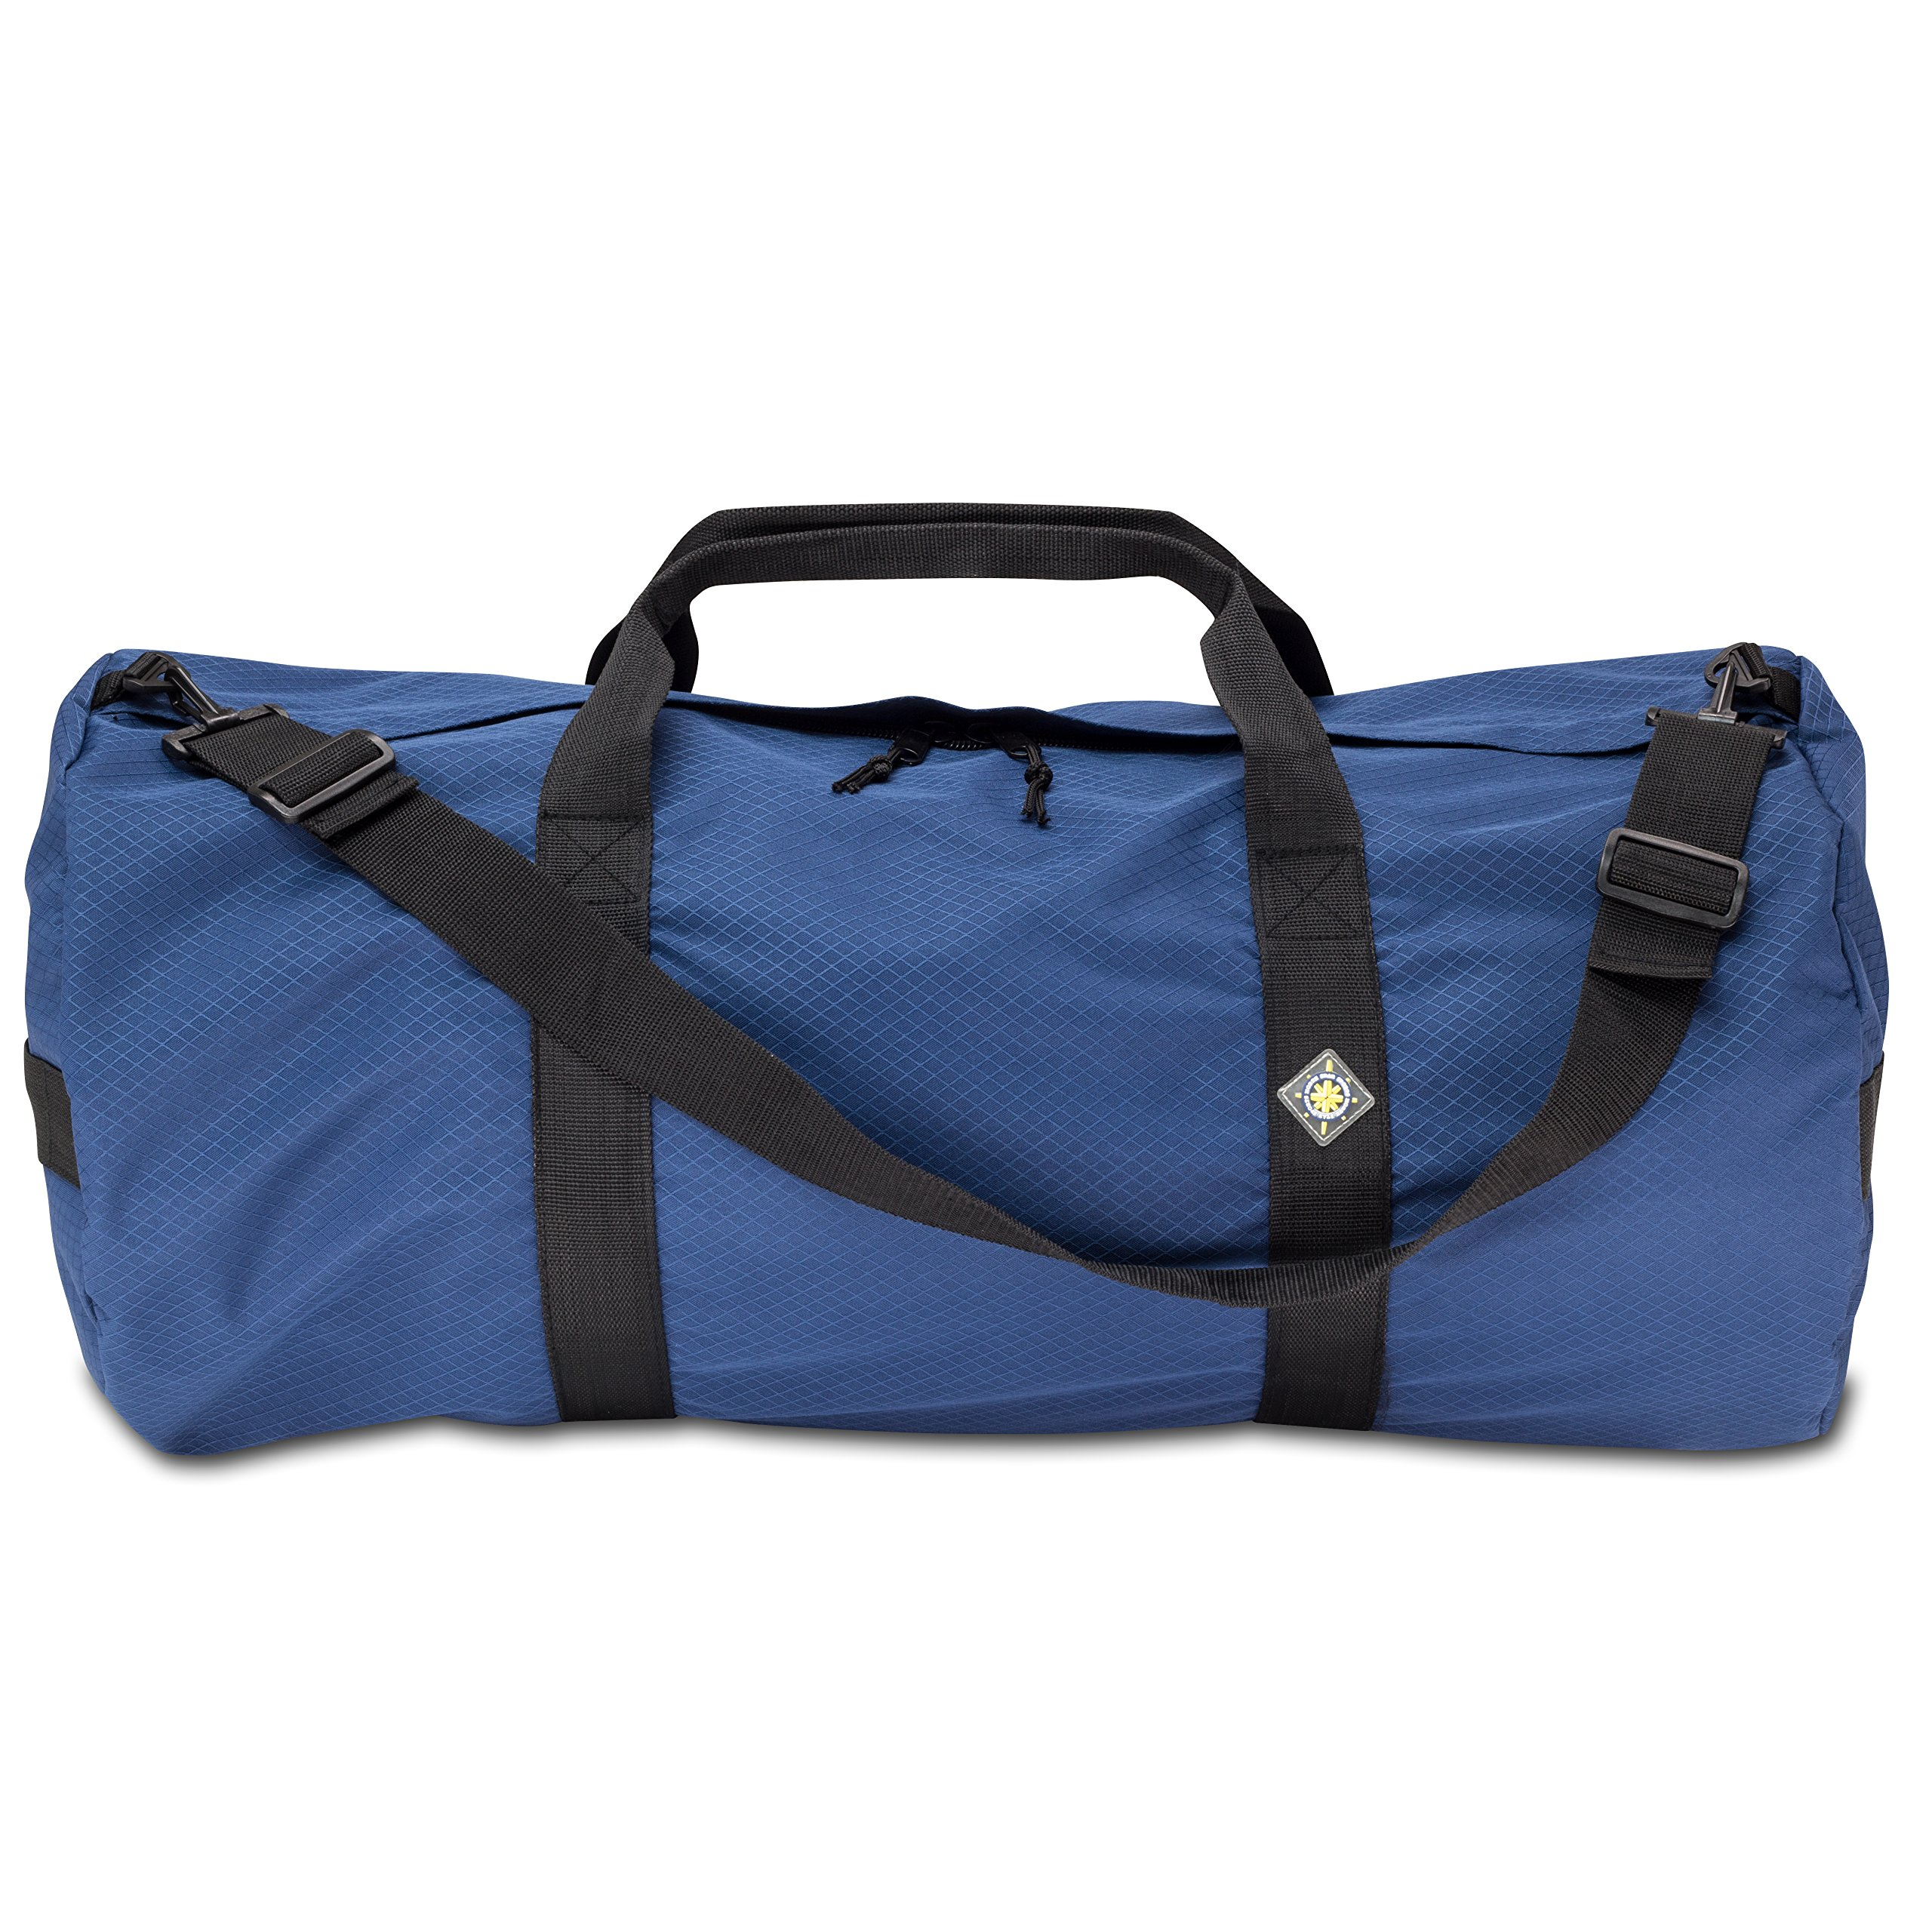 NorthStar Sports 1050 HD Tuff Cloth Diamond Ripstop Series Gear and Duffle Bag, 14 x 30-Inch, Pacific Blue